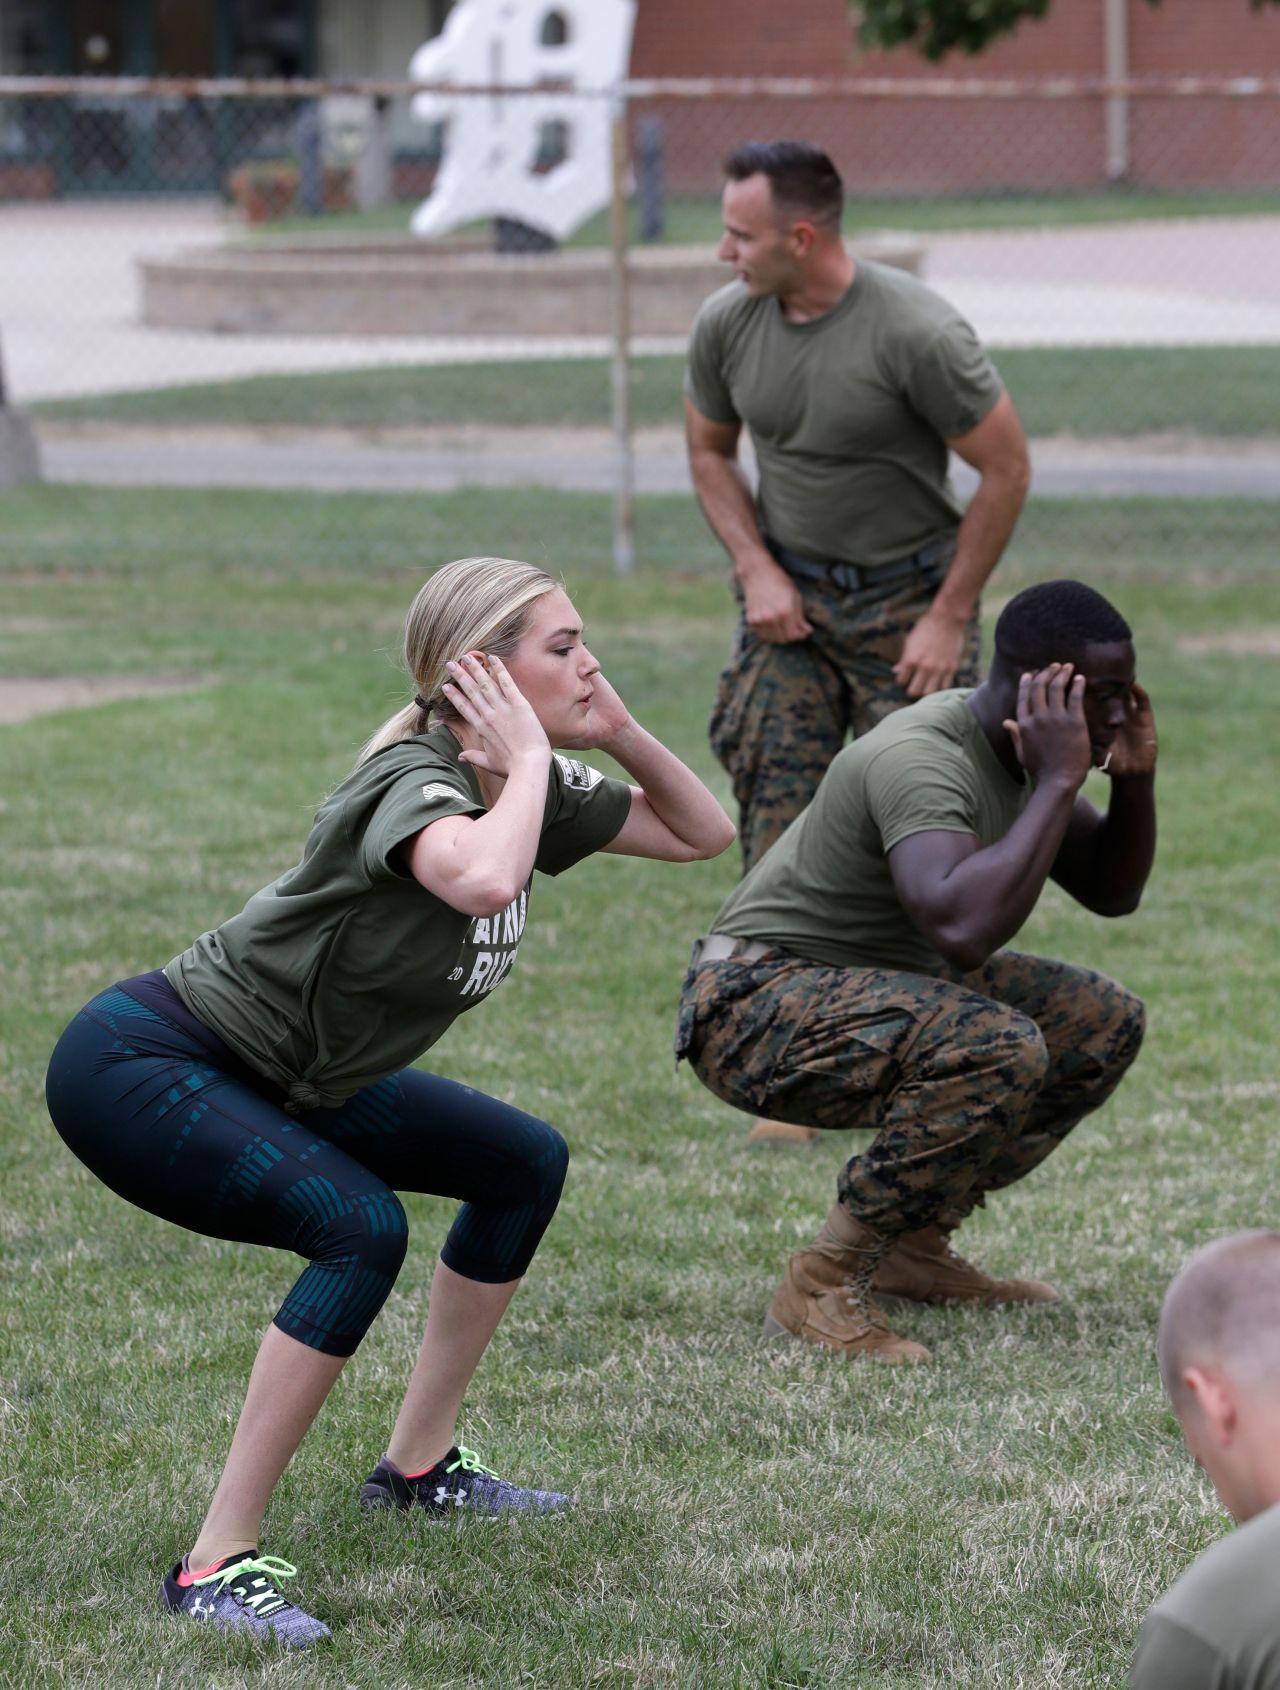 Kate Upton Marine Workout In Detroit 08 22 2017